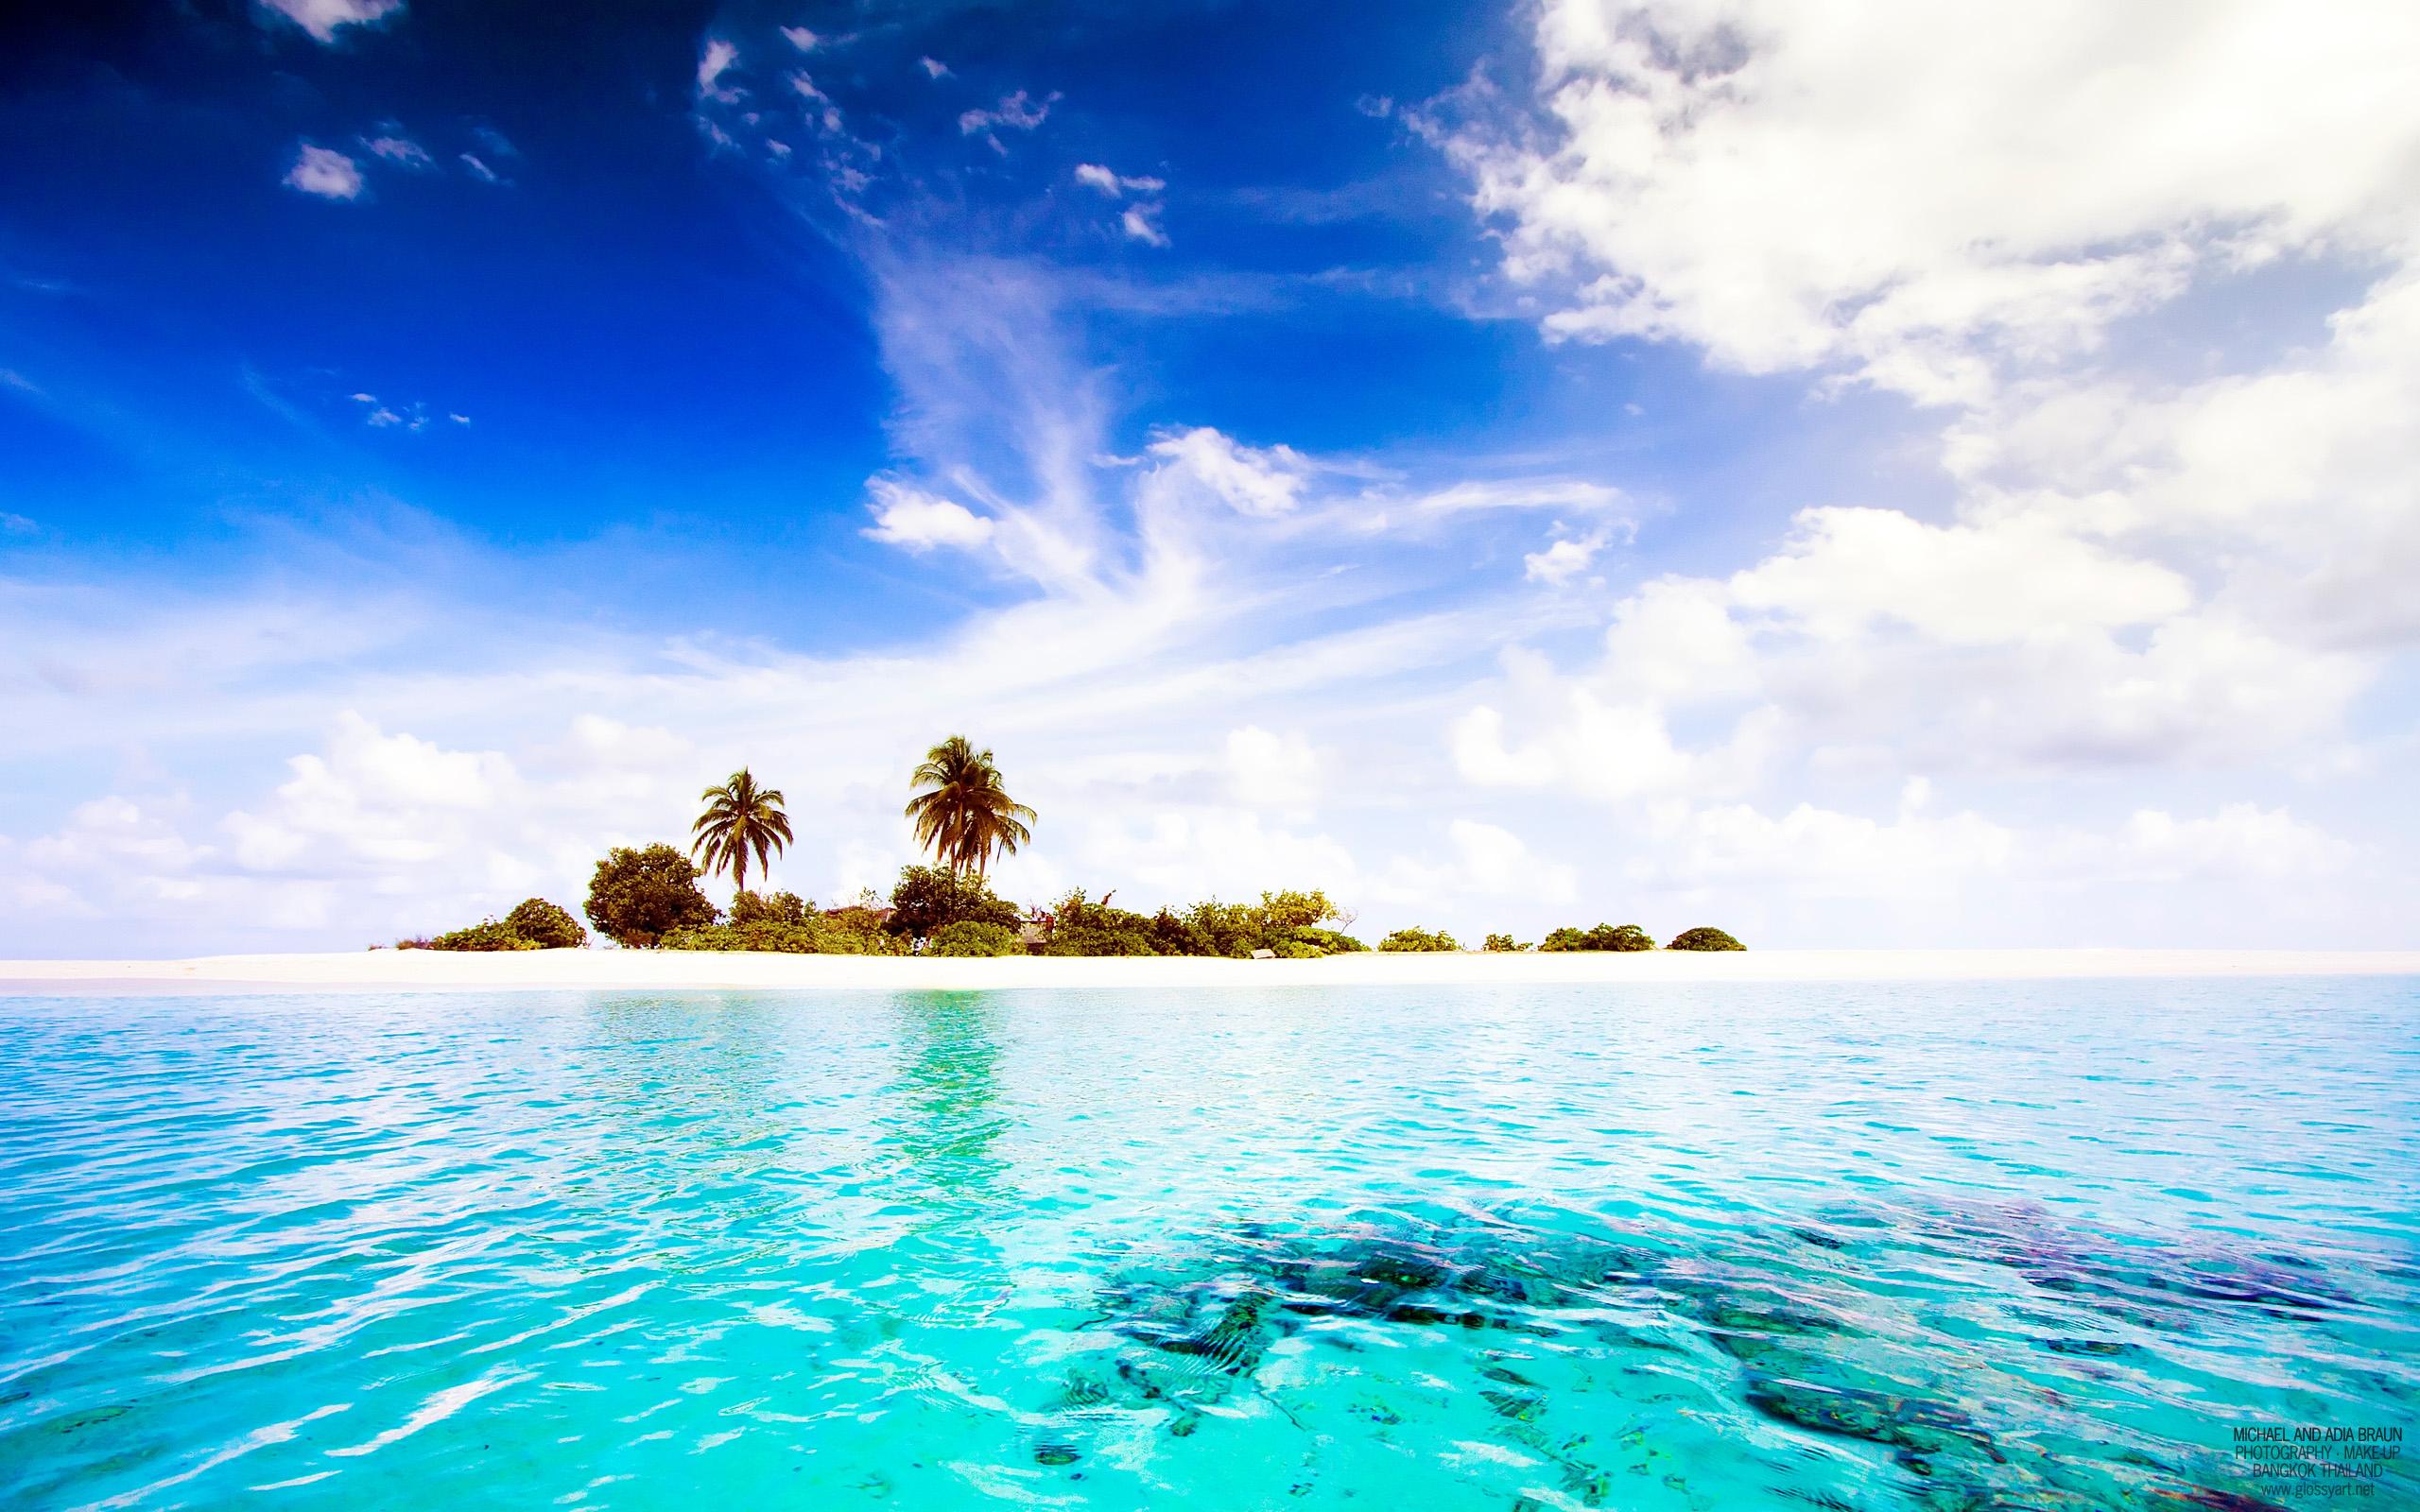 diggiri maldives beach island